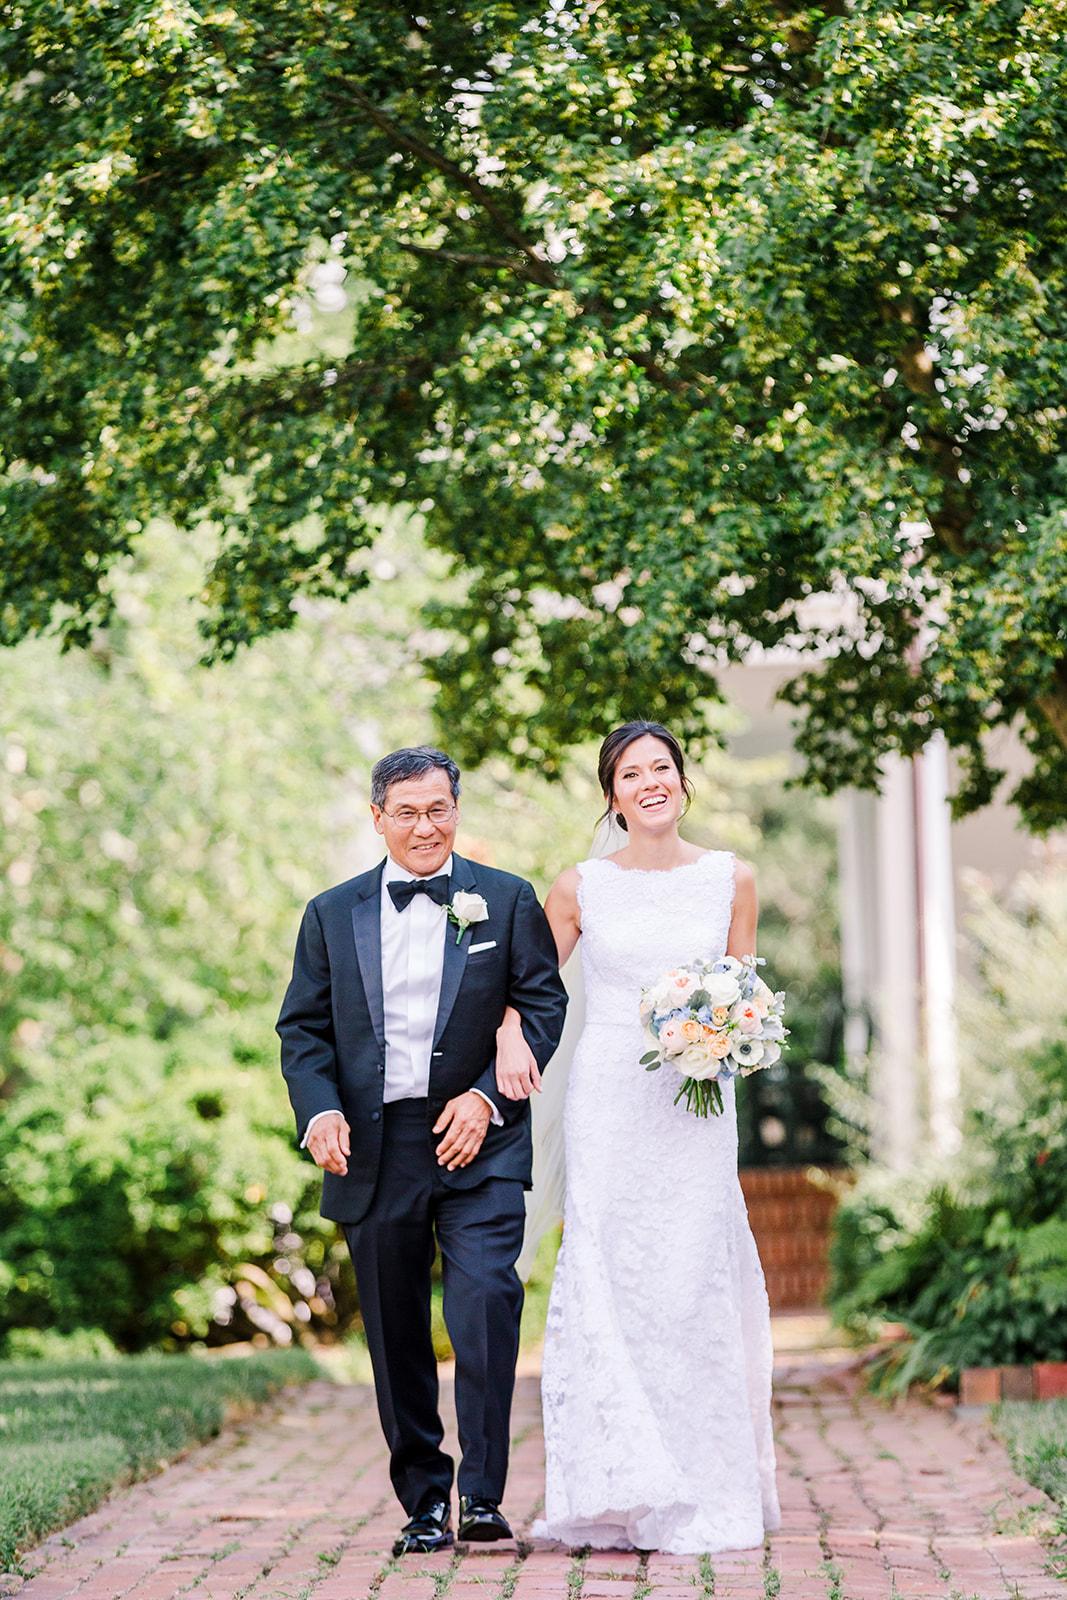 Jon & Christina Blue and white garden wedding  - River Farm, VA